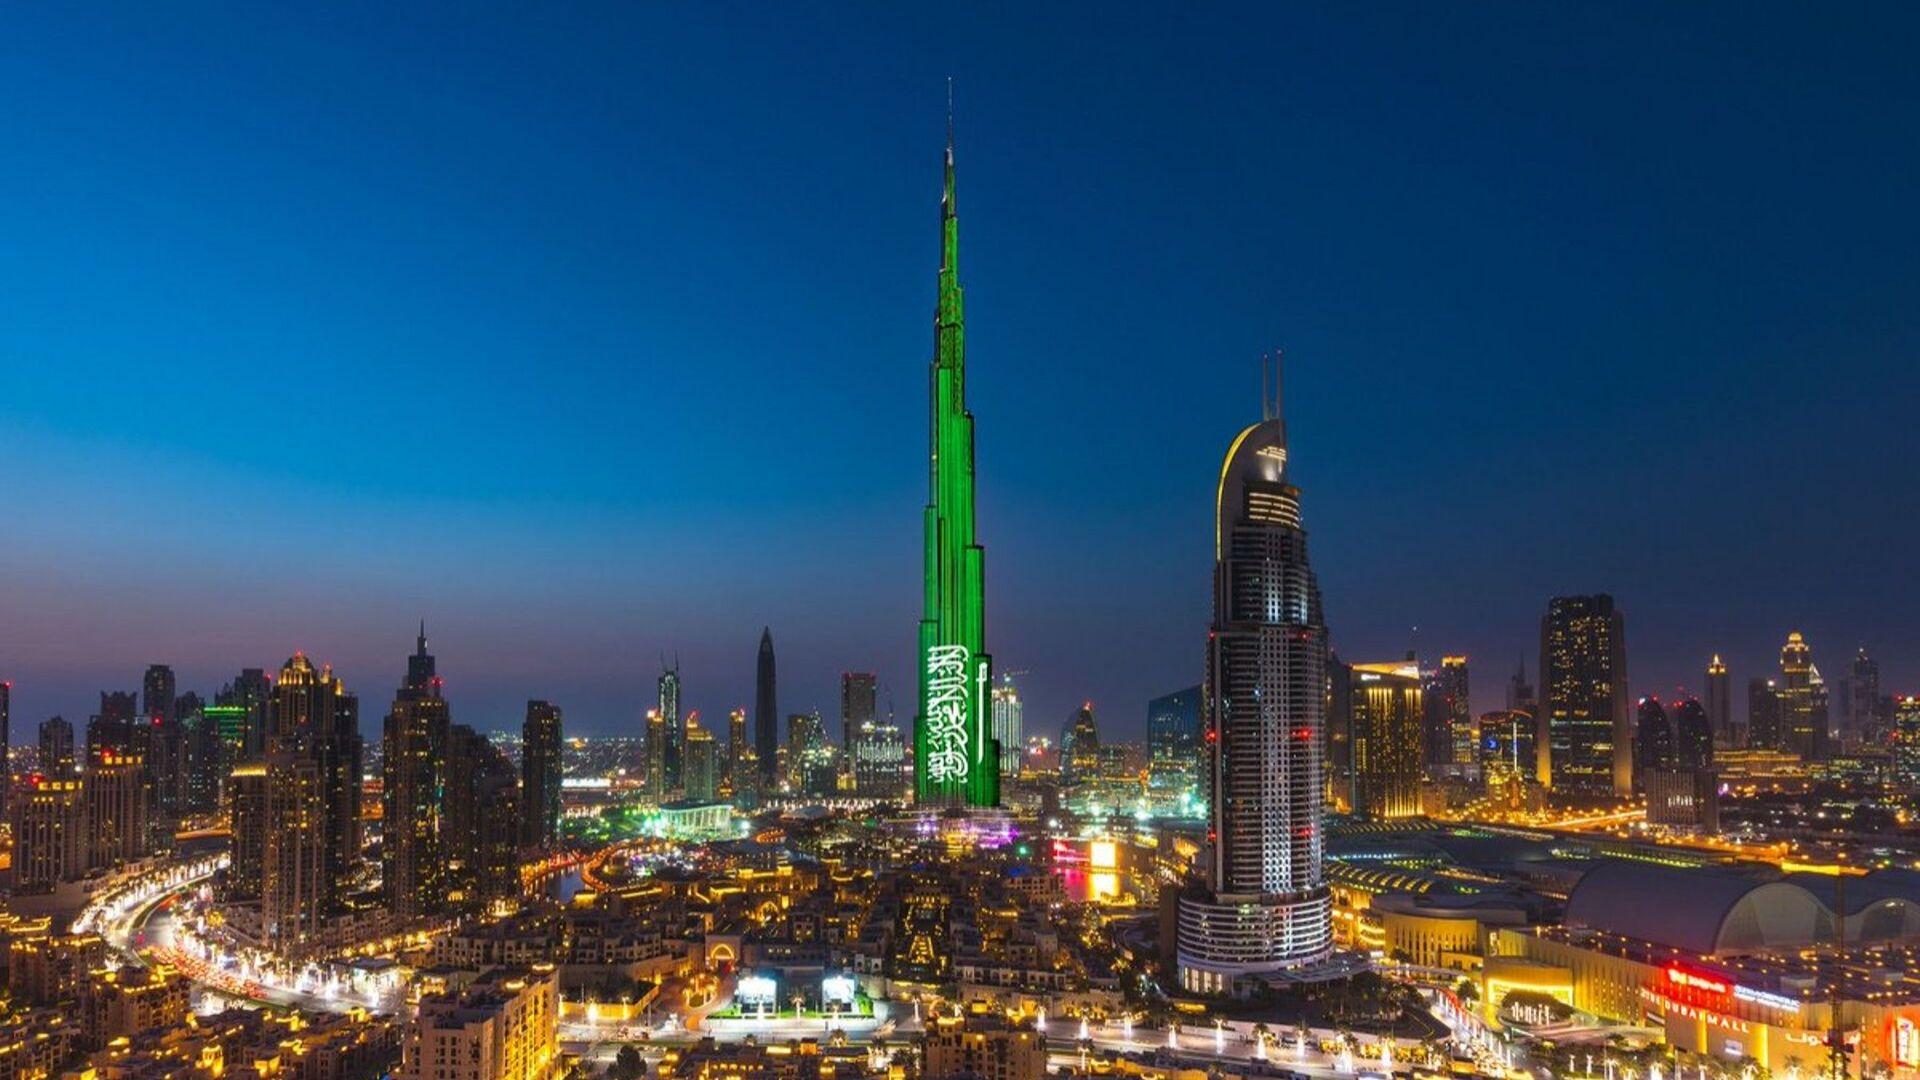 Burj Khalifa Saudi National Day 2019 celebration